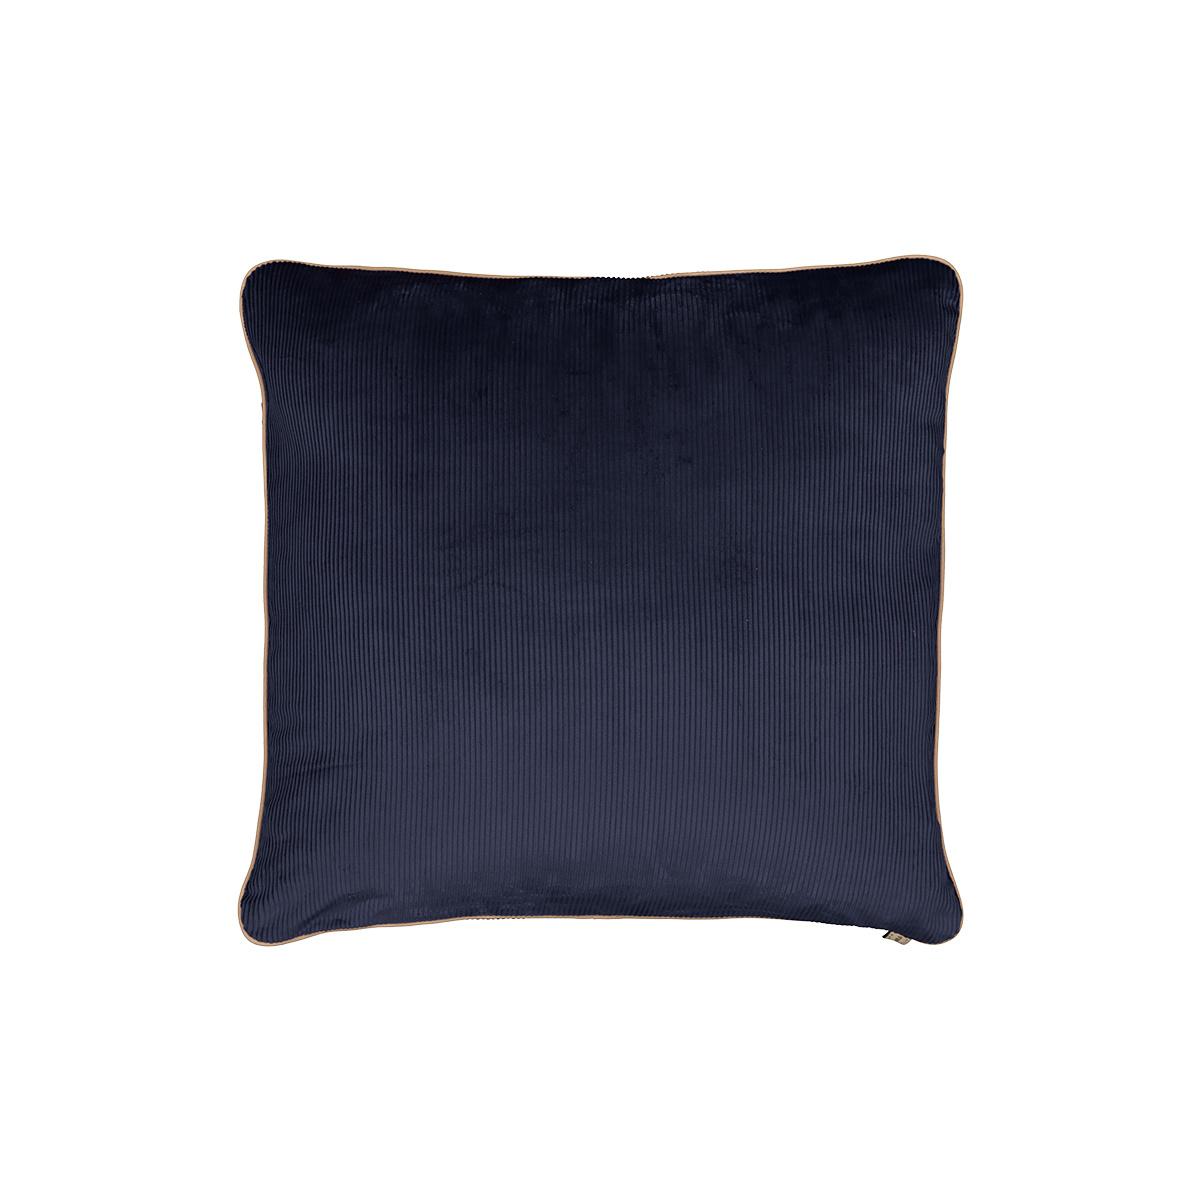 Carino Cushion, Navy Blue Corduroy Velvet